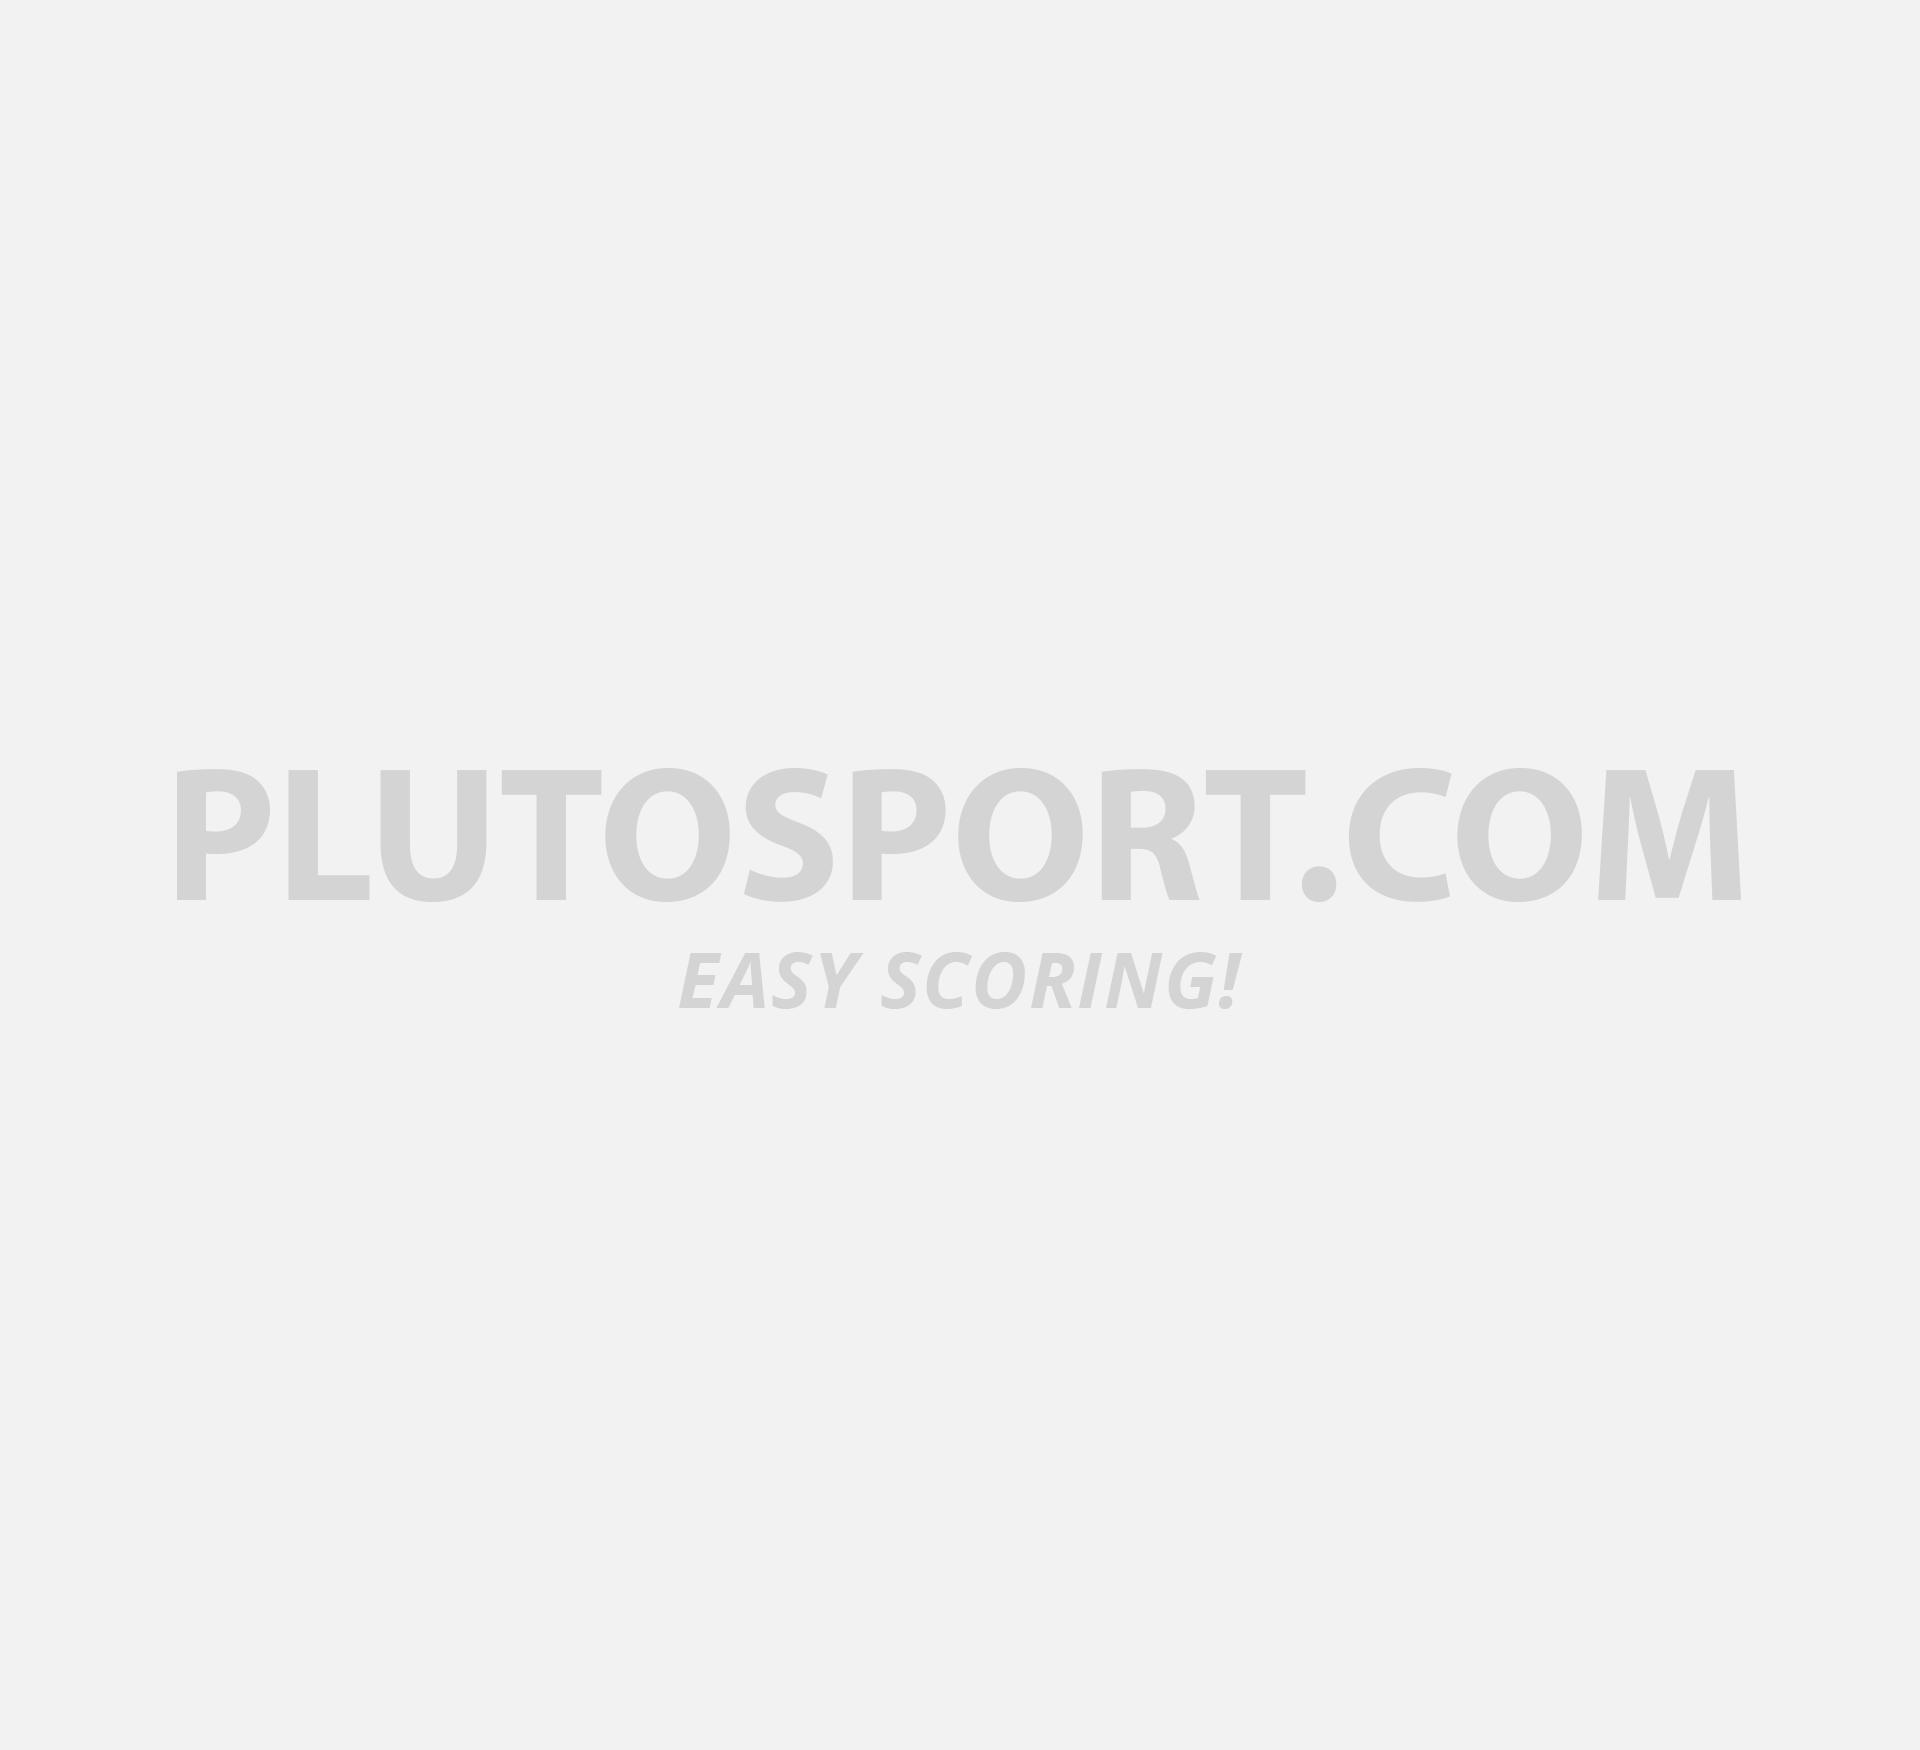 634f160d6 Mens Adidas Samba Millennium Indoor Soccer Shoe White Blue Grey 952 LRG adidas  indoor samba  8324953 adidas indoor samba